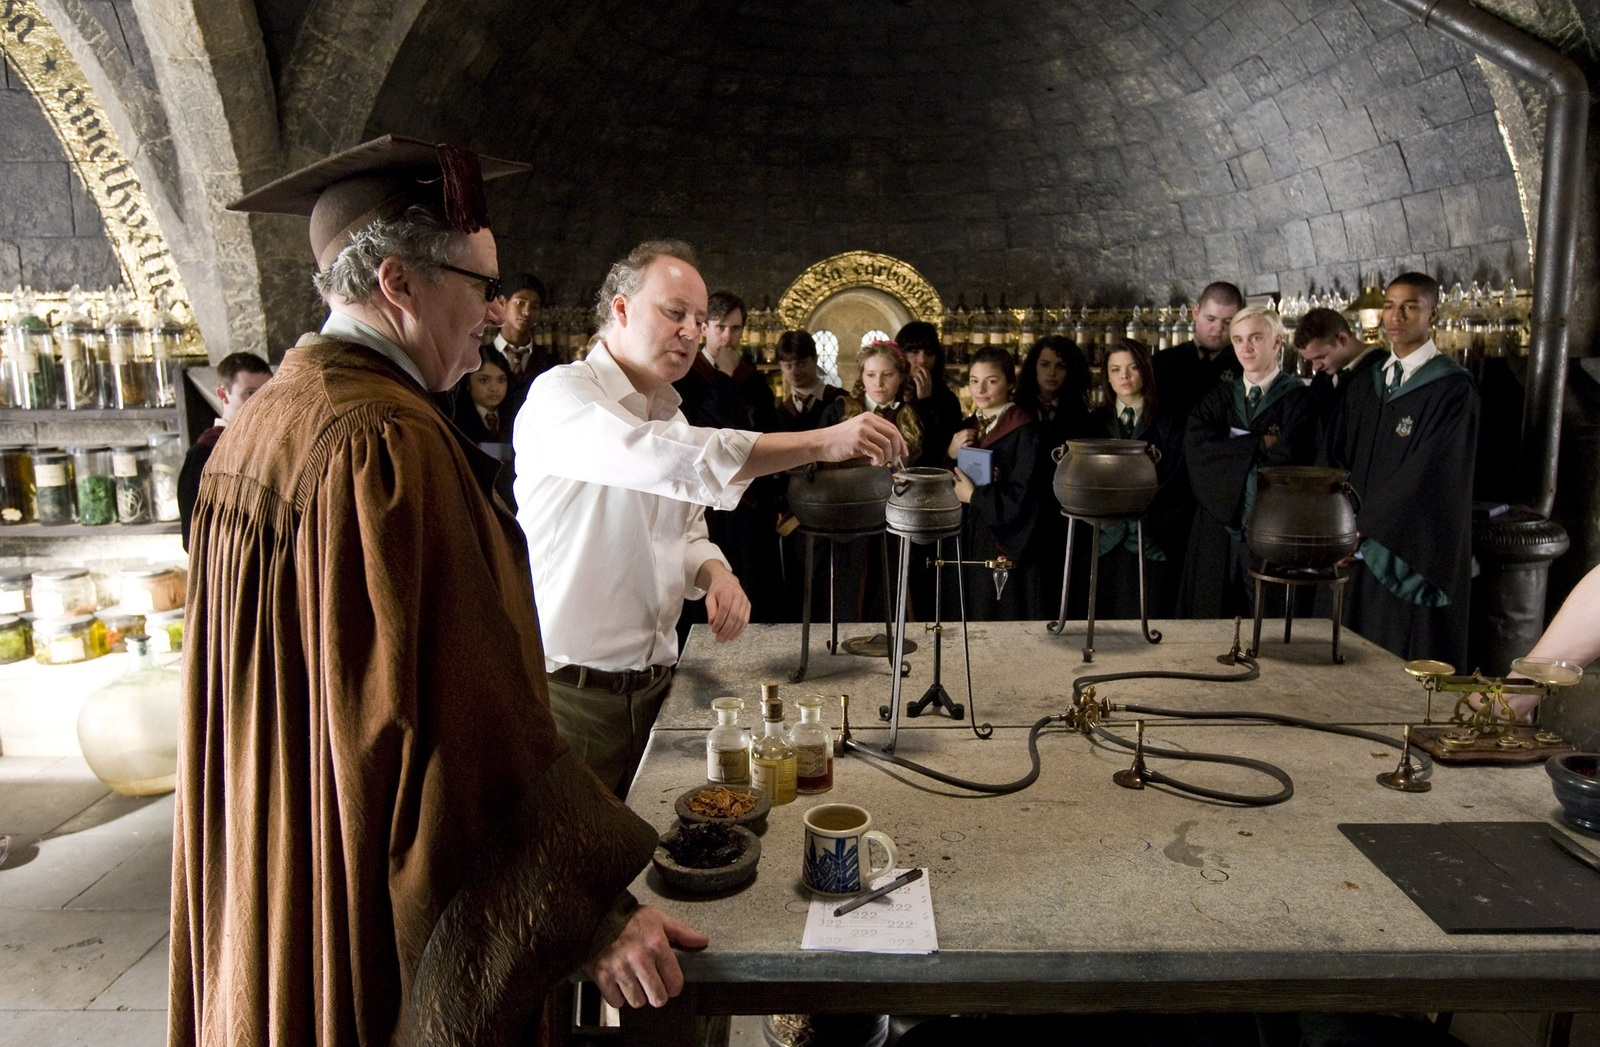 Съемка гарри поттер и принц полукровка брюс уиллис и деми мур биография